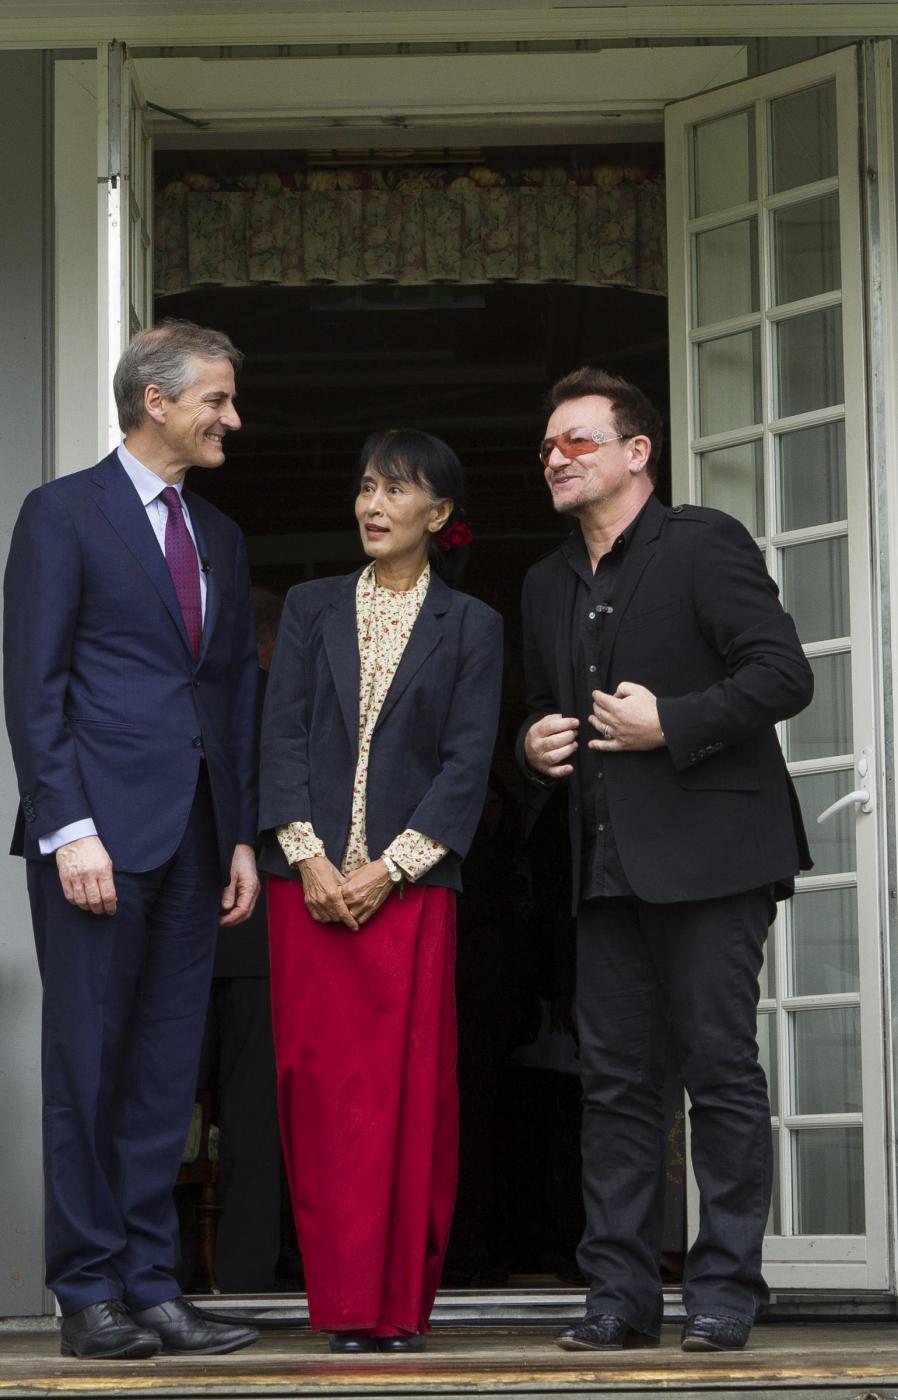 Oslo, Aung san Suu Kyi incontra la star degli U2 Bono07